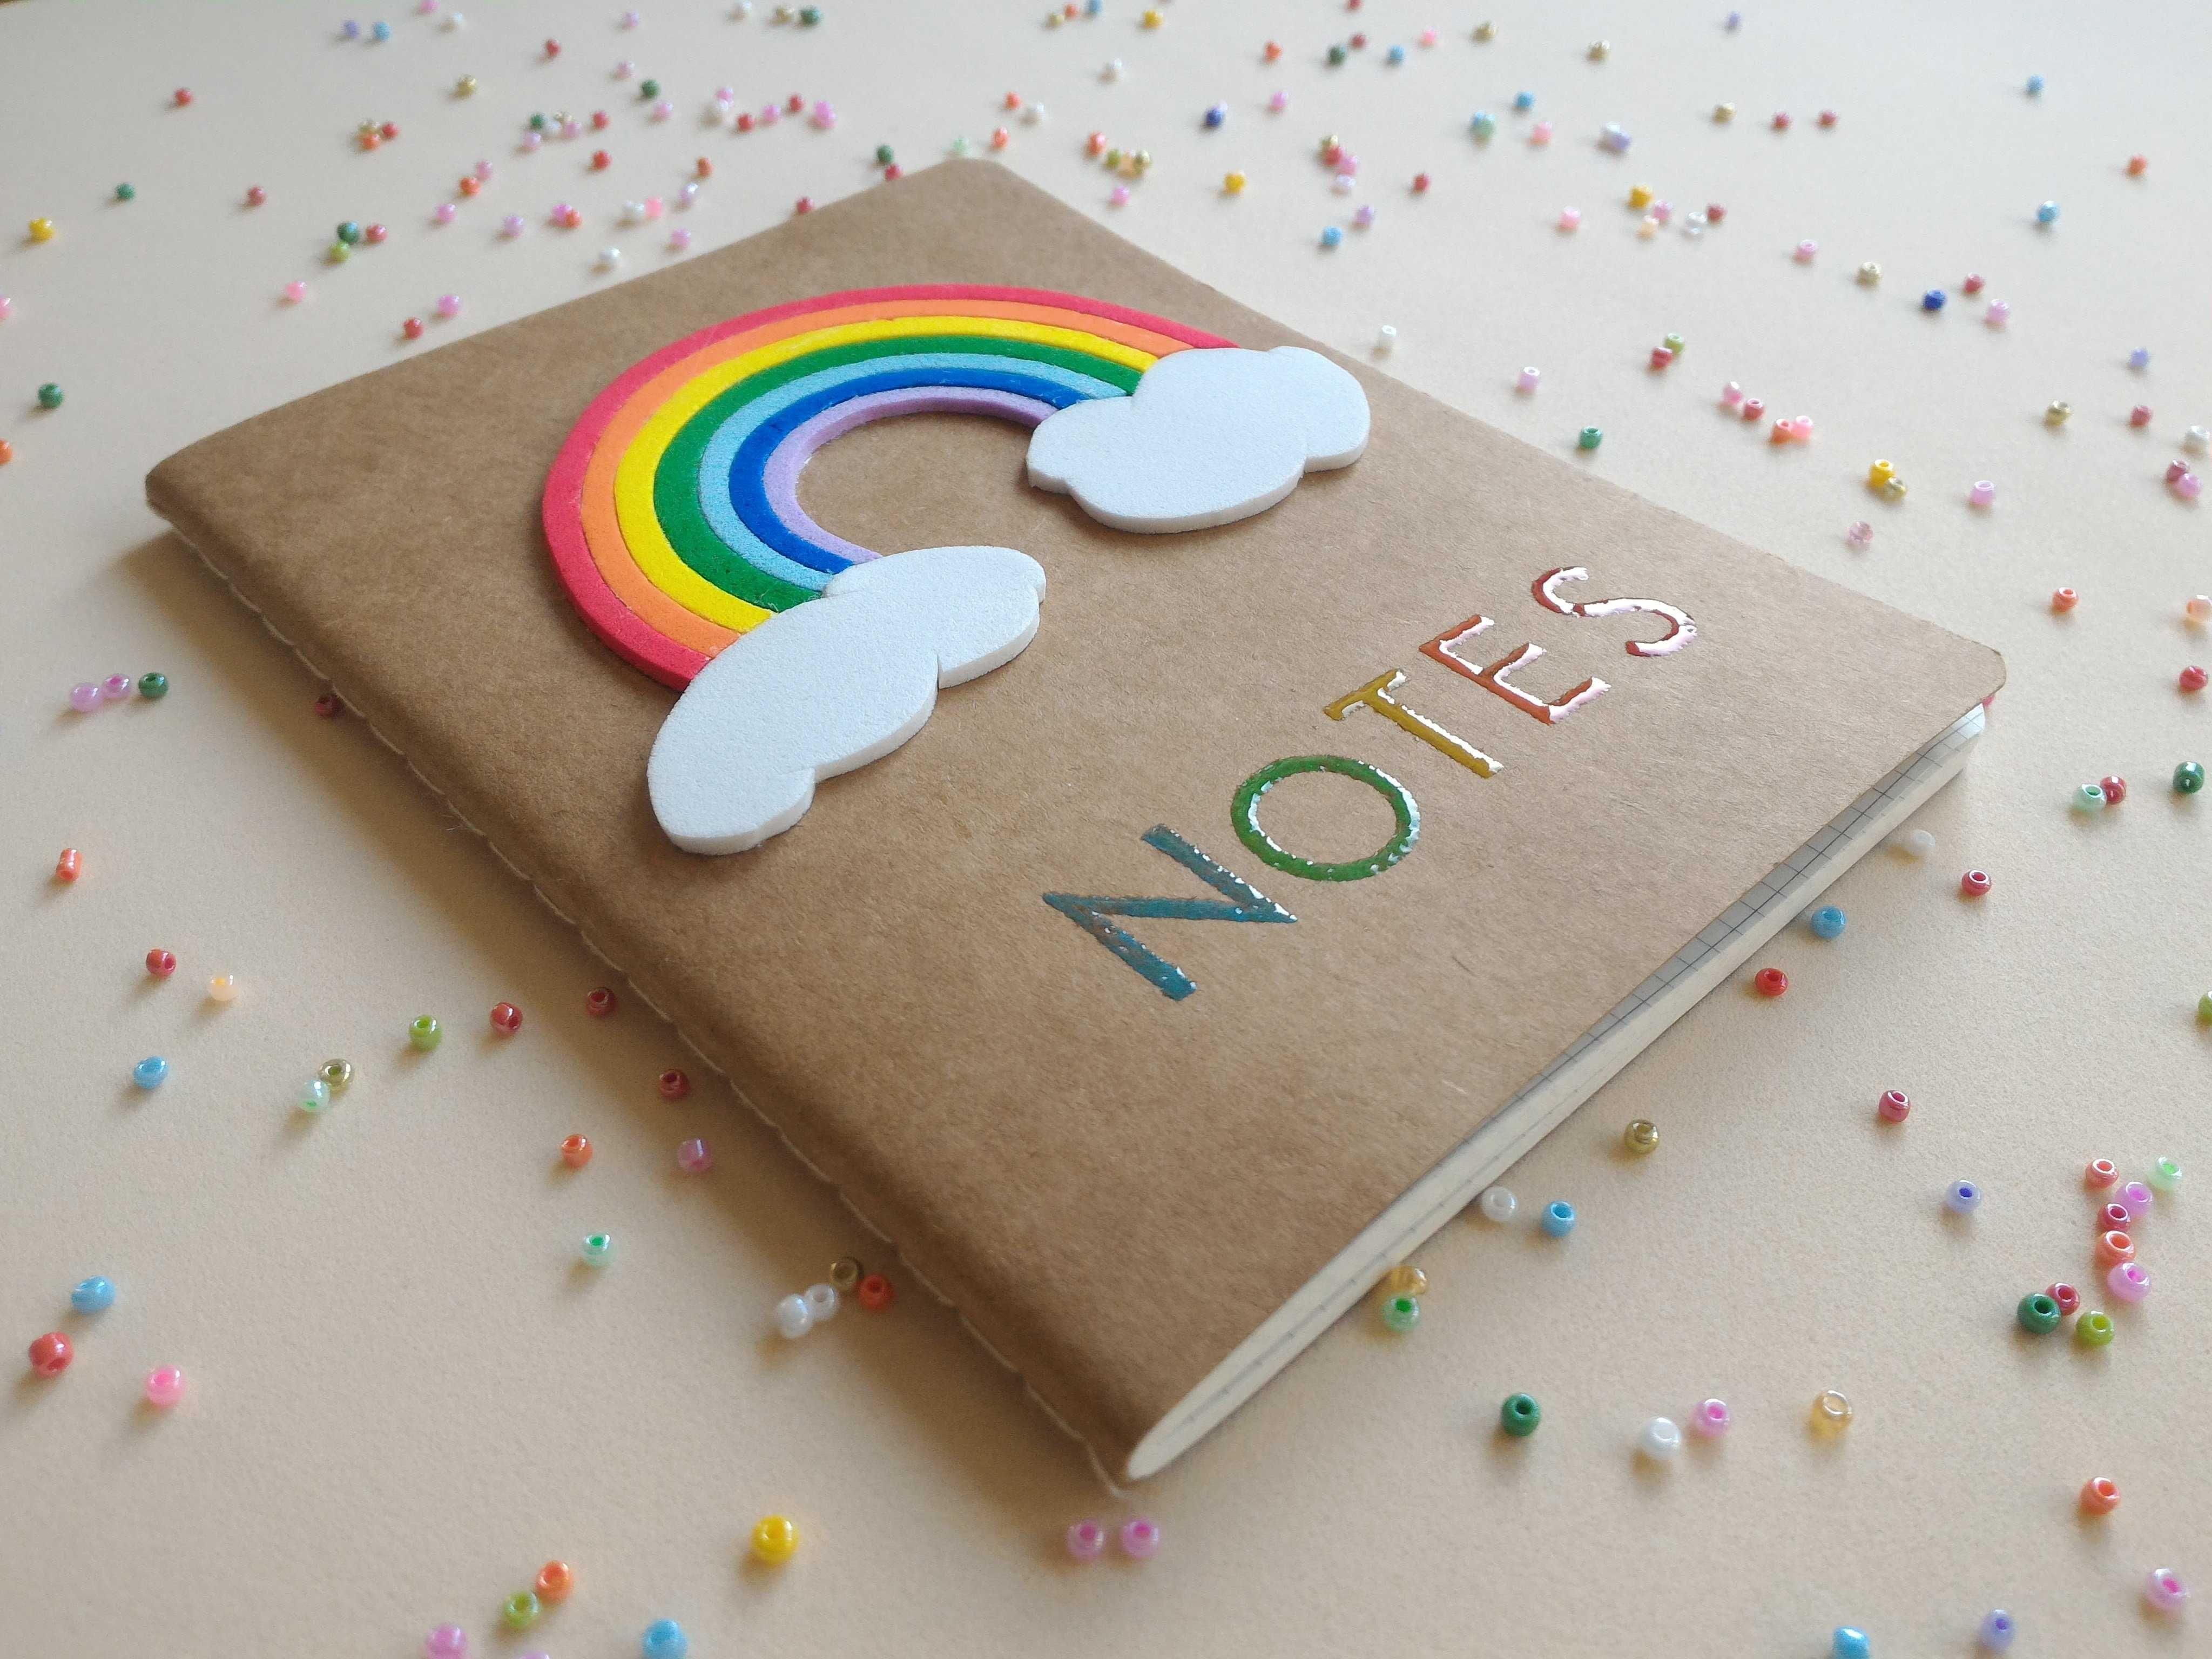 carnet rainbow projekty na vyzkou en pinterest rainbow diy a notebook. Black Bedroom Furniture Sets. Home Design Ideas